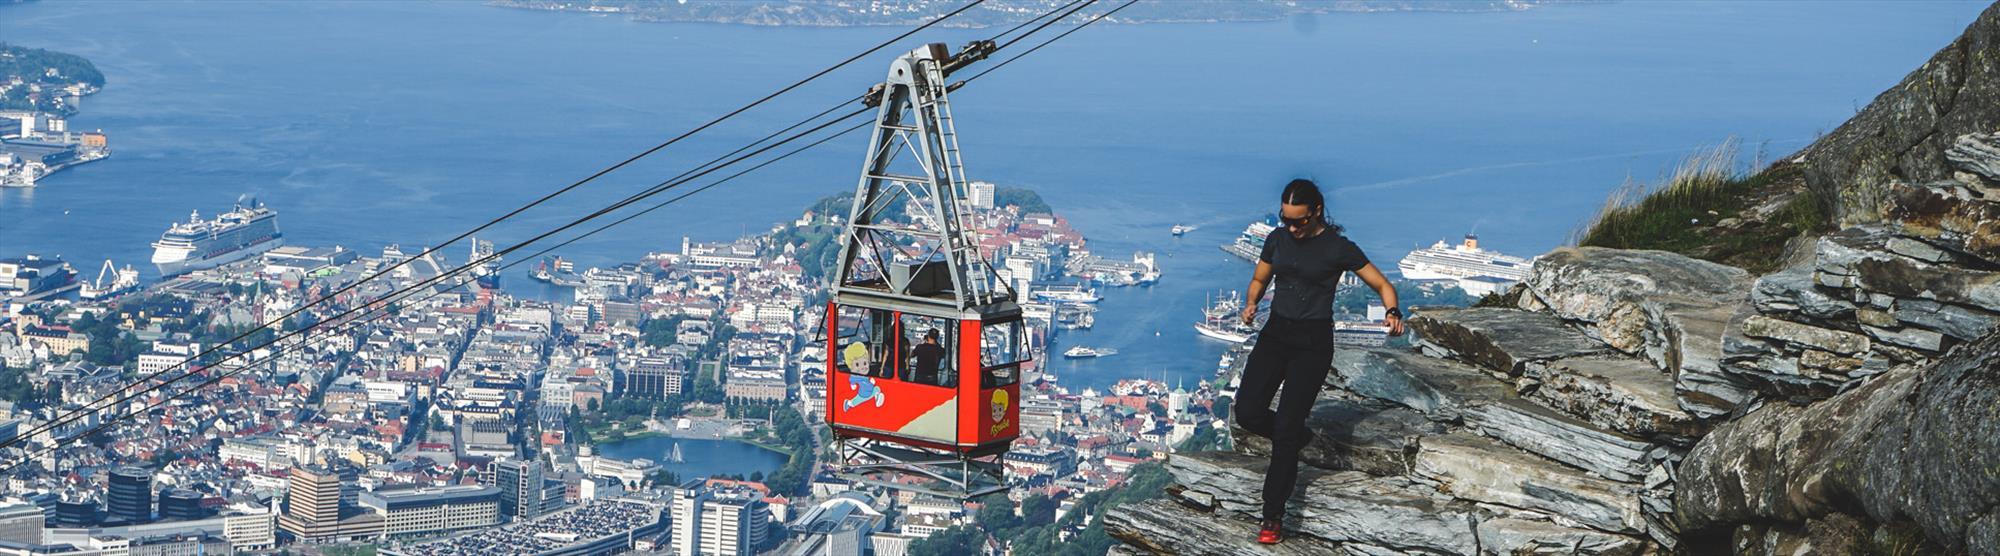 Erlebnisse in Bergen